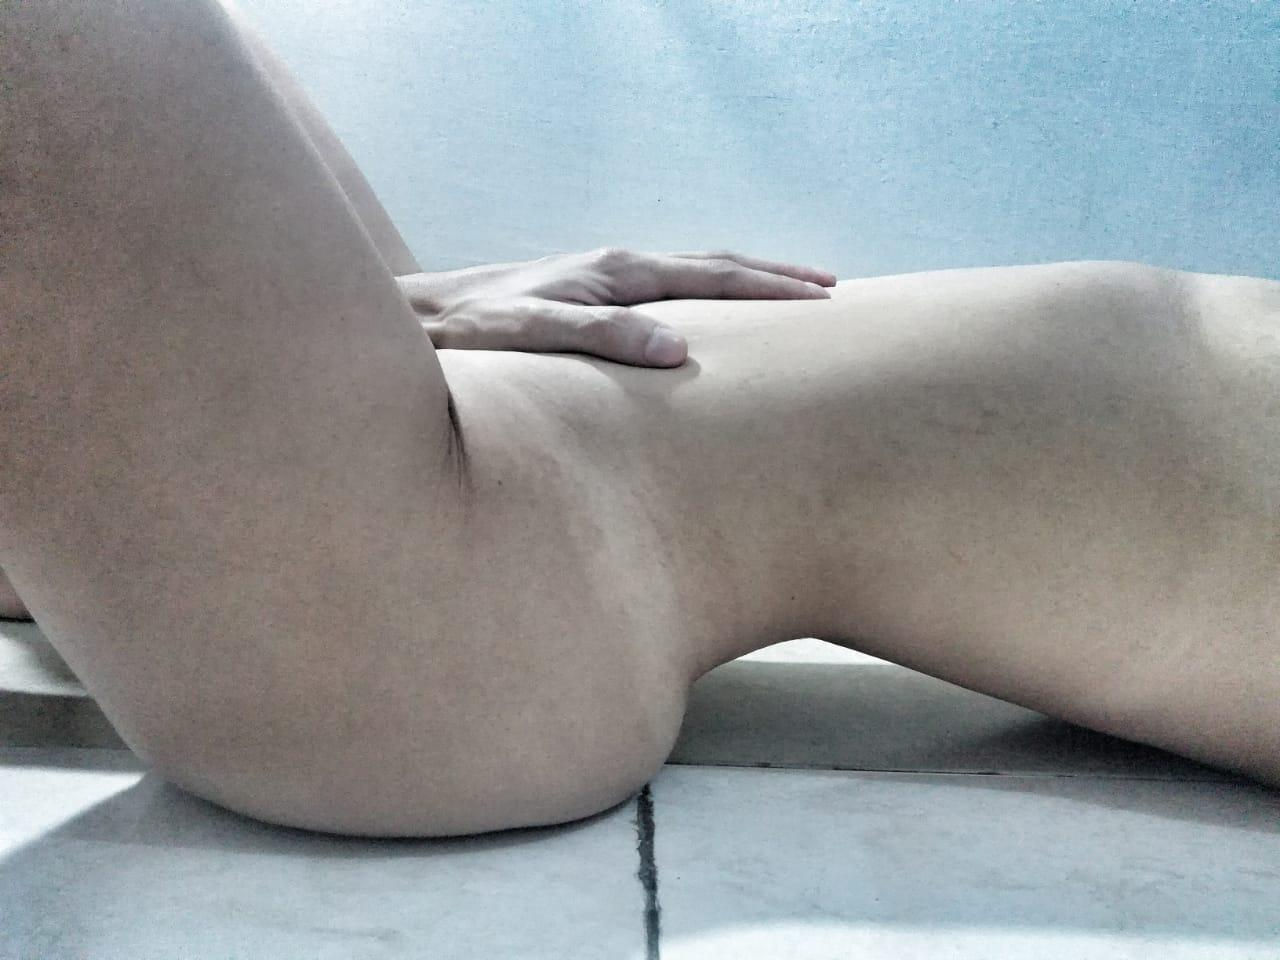 Sex horny?s=ag6vnydg5ept38xou+pkomyqy2fn+vz4gwq5tzmtgzc=